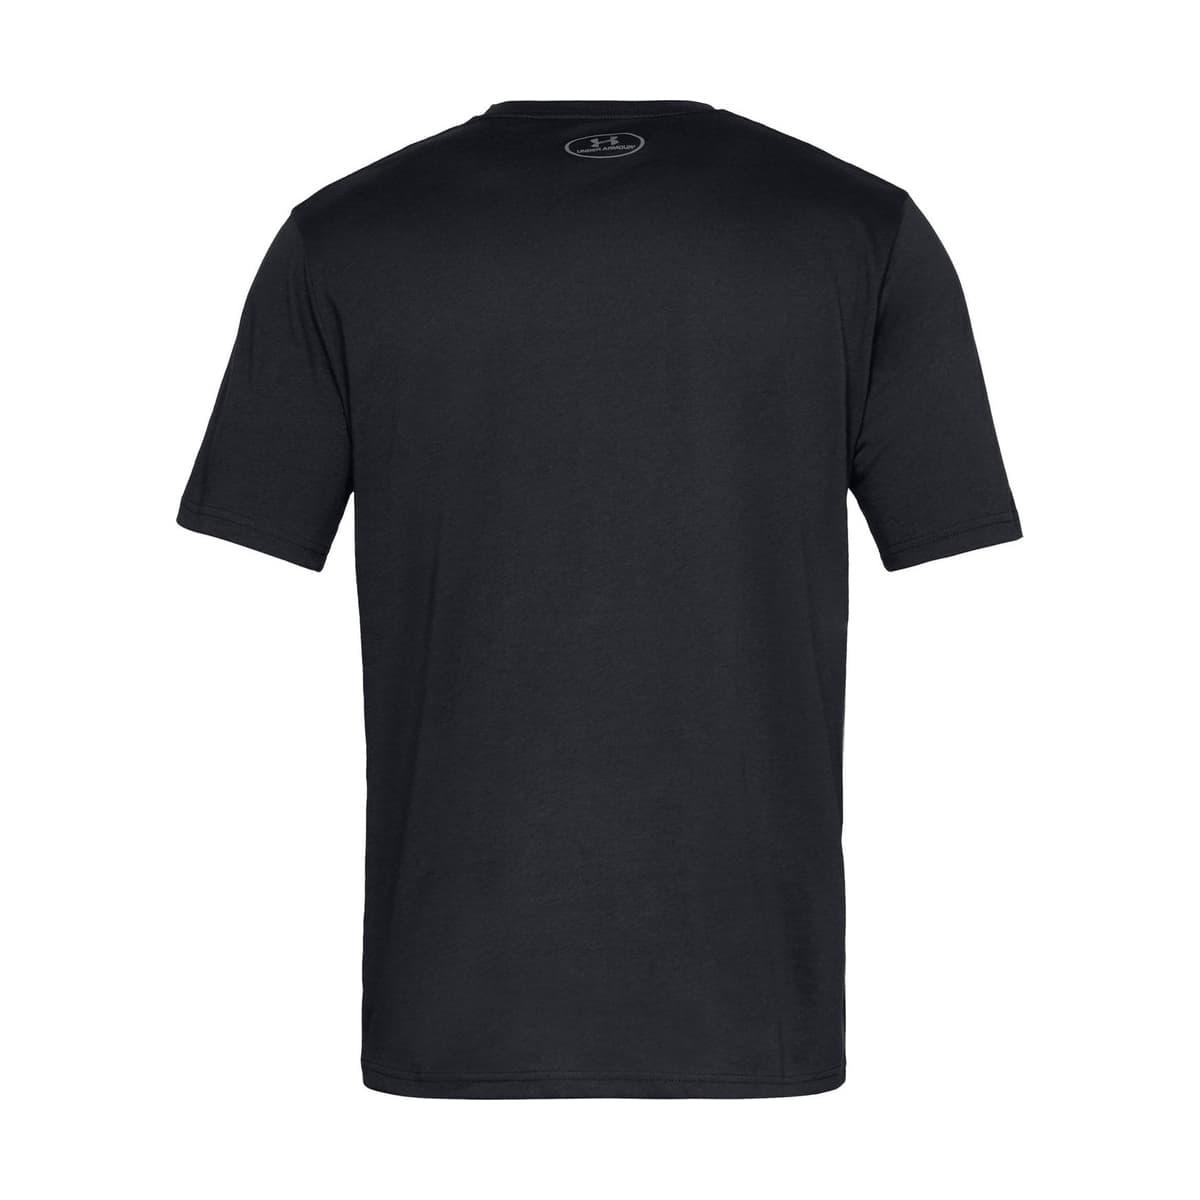 Big Logo Erkek Siyah Tişört (1329583-001)